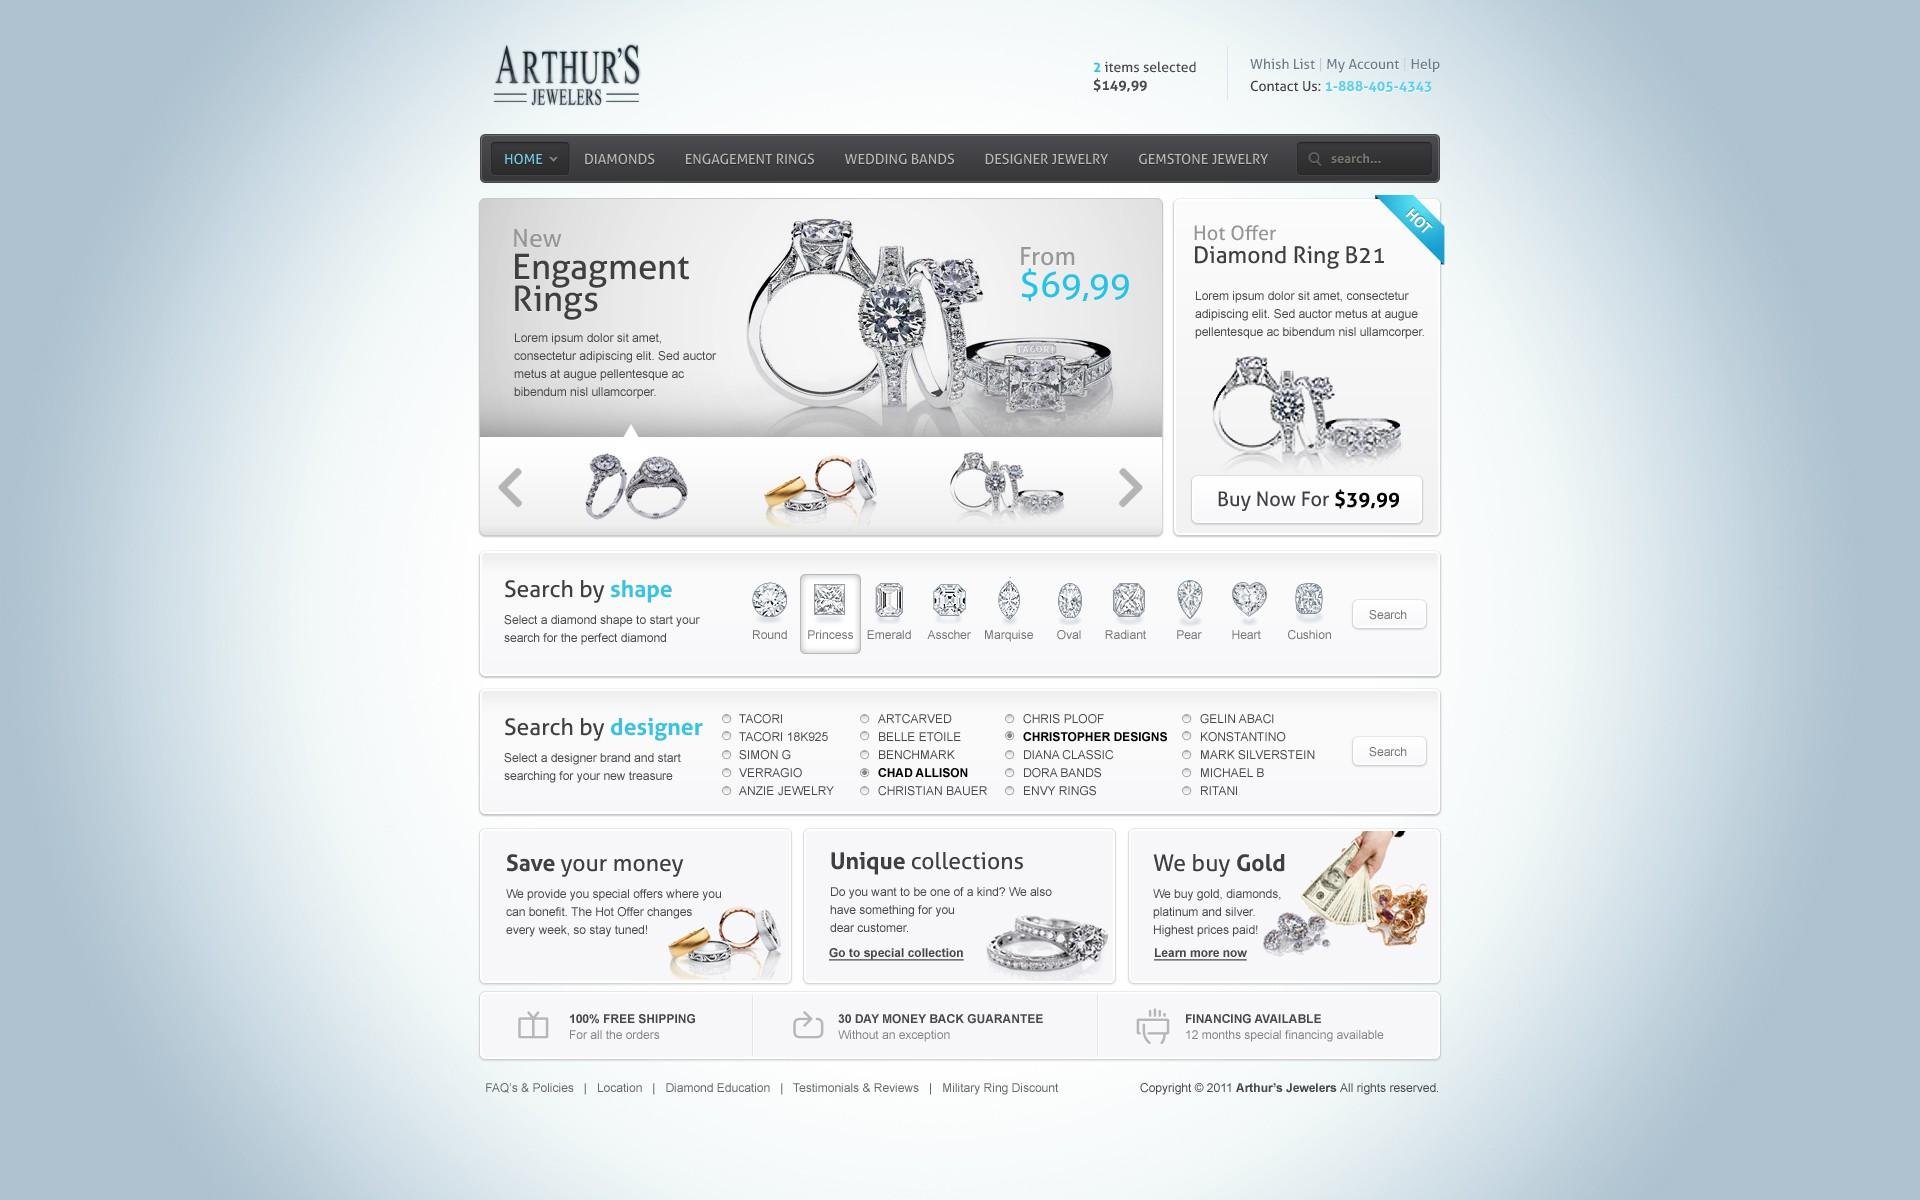 Arthurs Jewelers needs a new website design